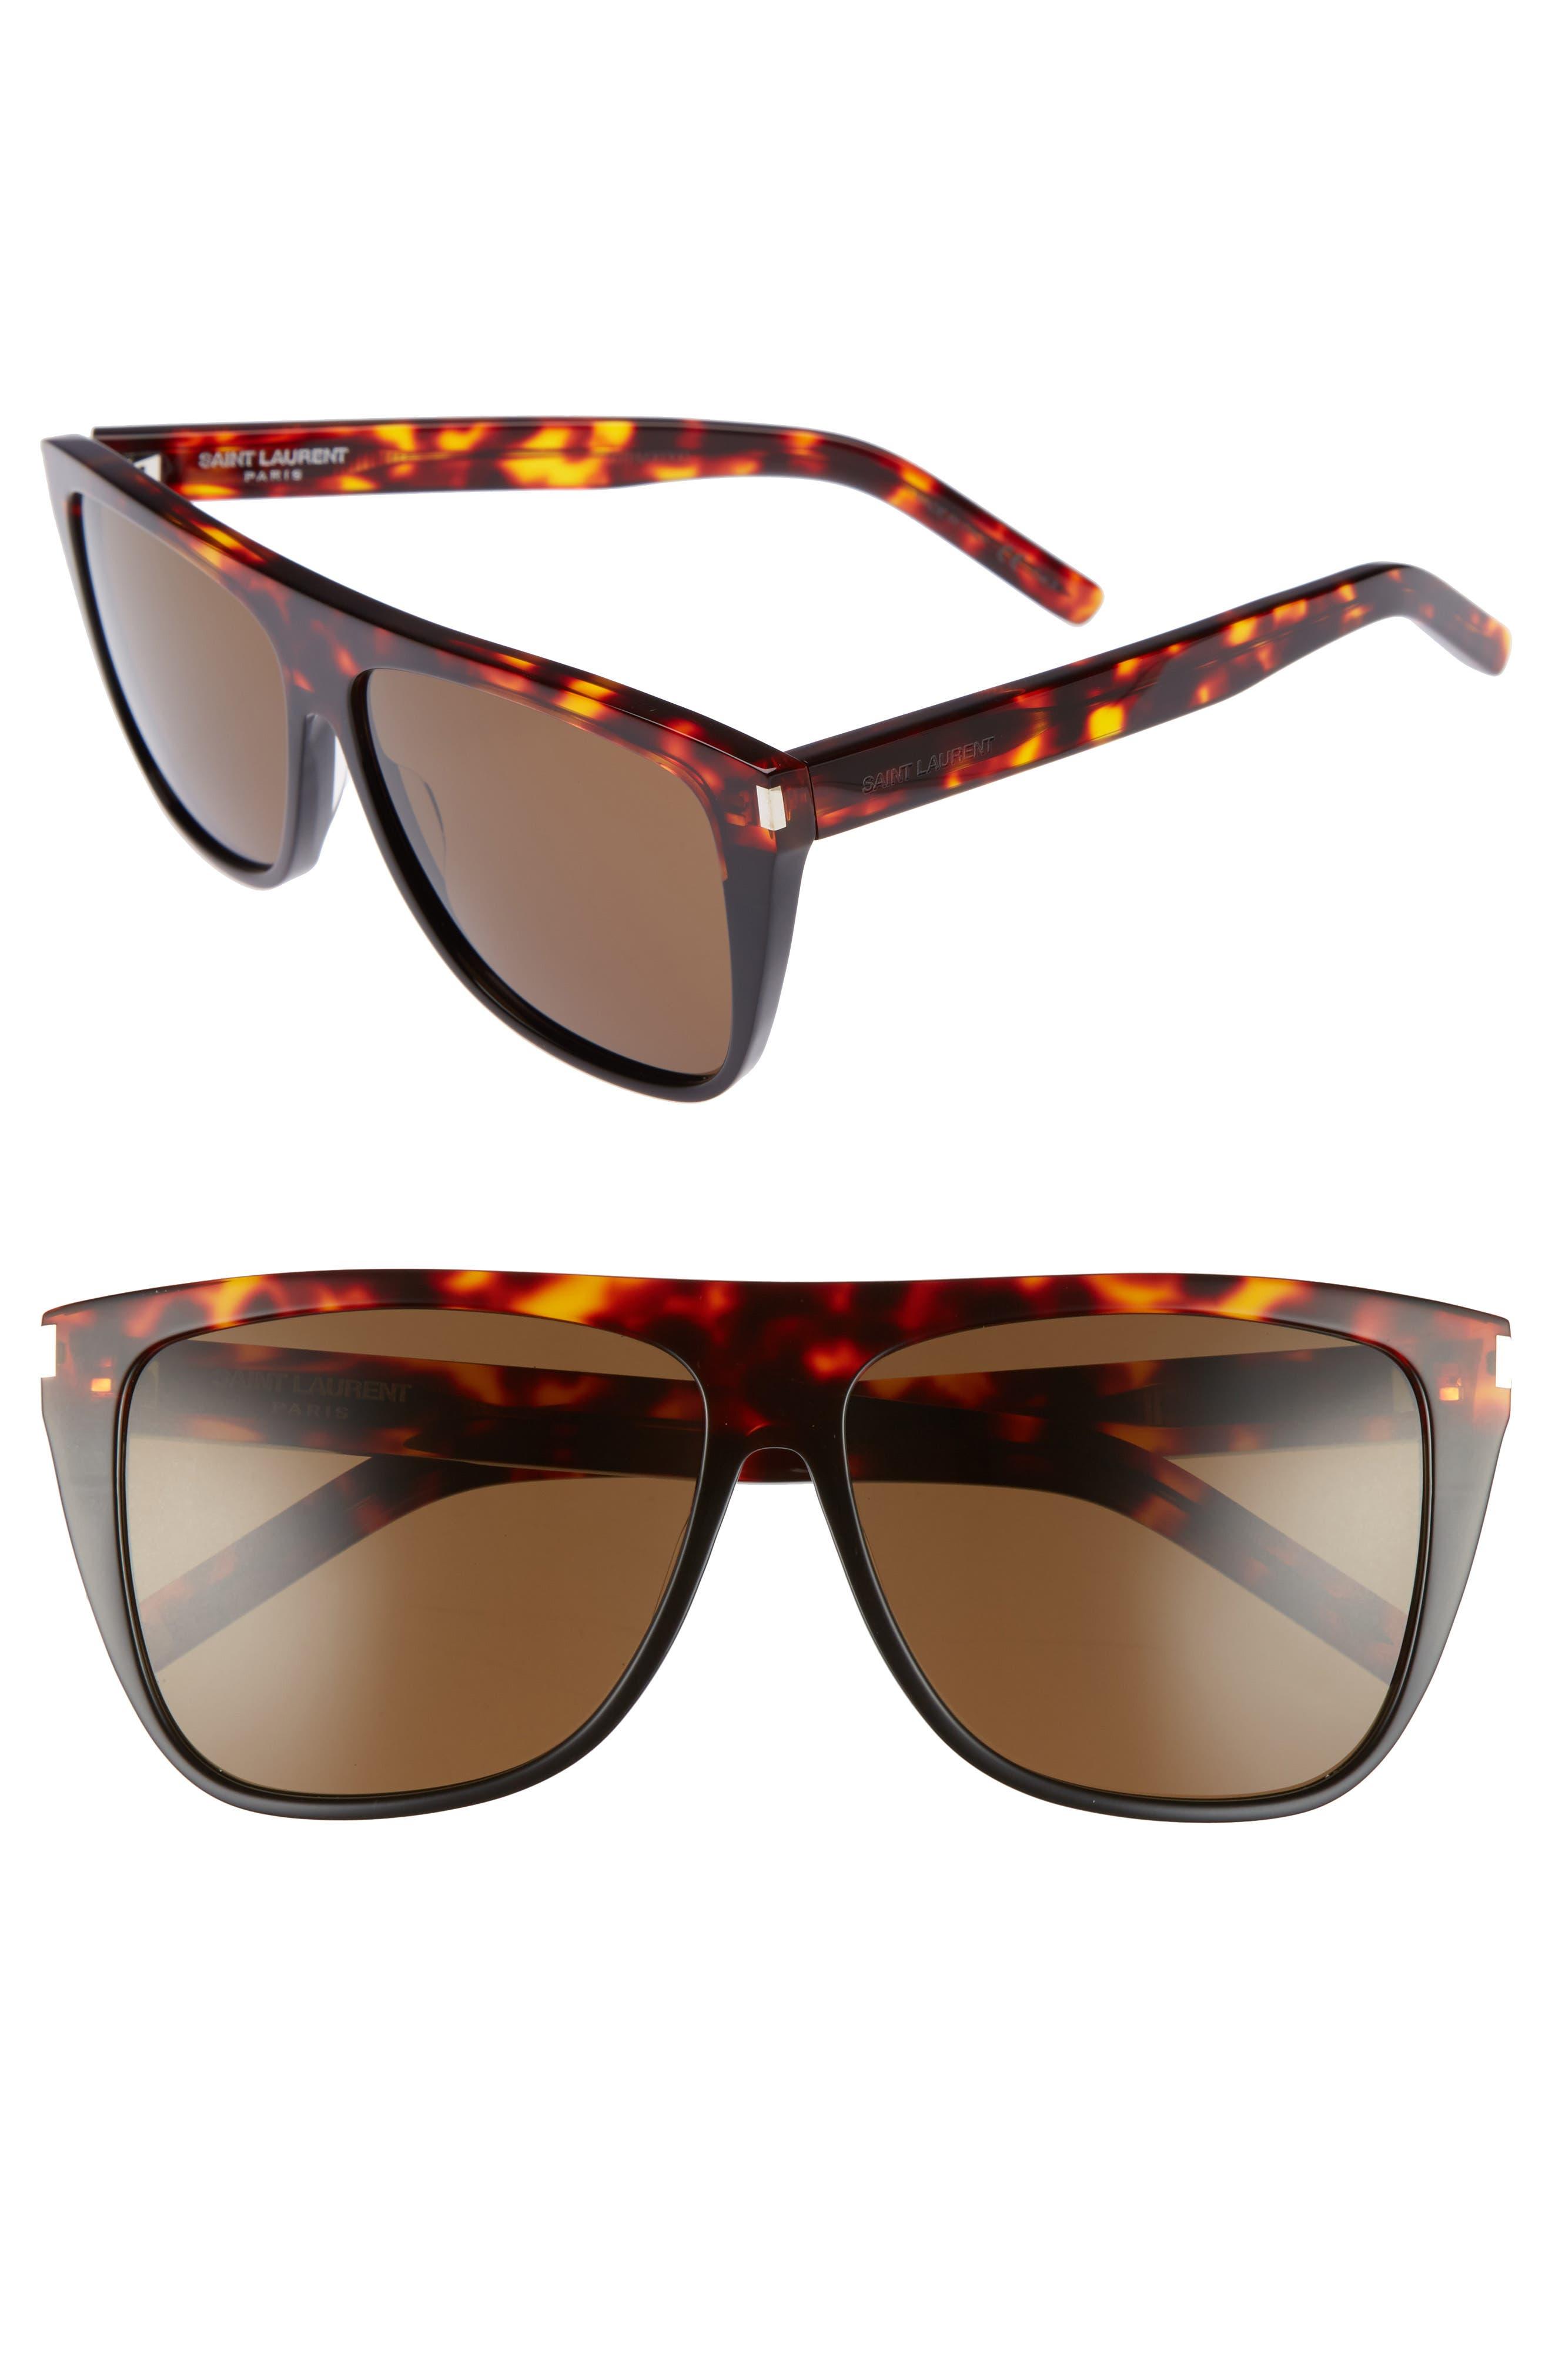 SL1 59mm Flat Top Sunglasses,                             Main thumbnail 1, color,                             HAVANA